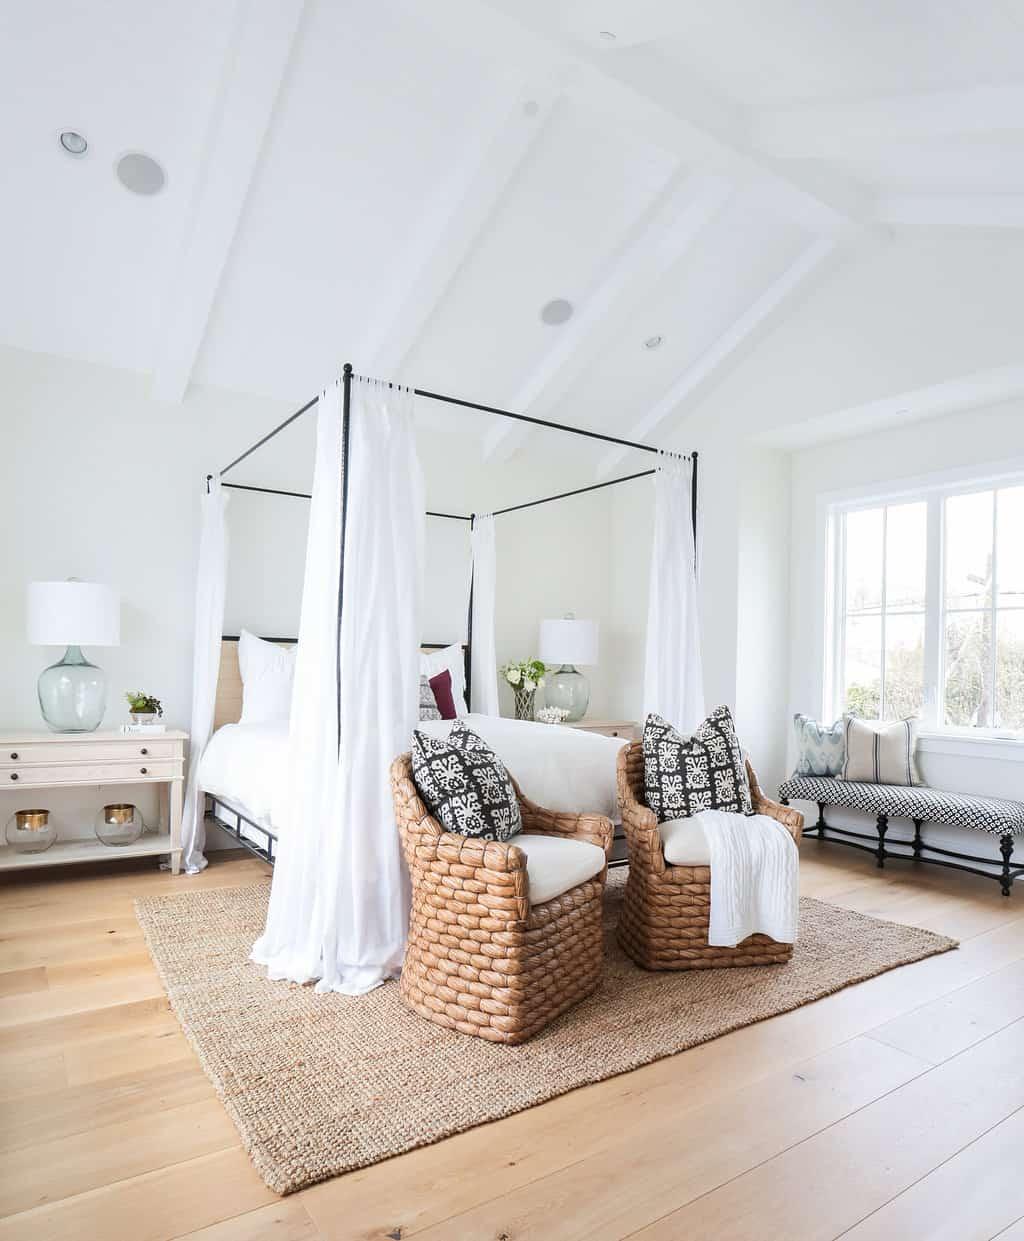 Modern Coastal Bedroom Ideas: HOM: Modern Farmhouse With Coastal Flare By Blackband Design